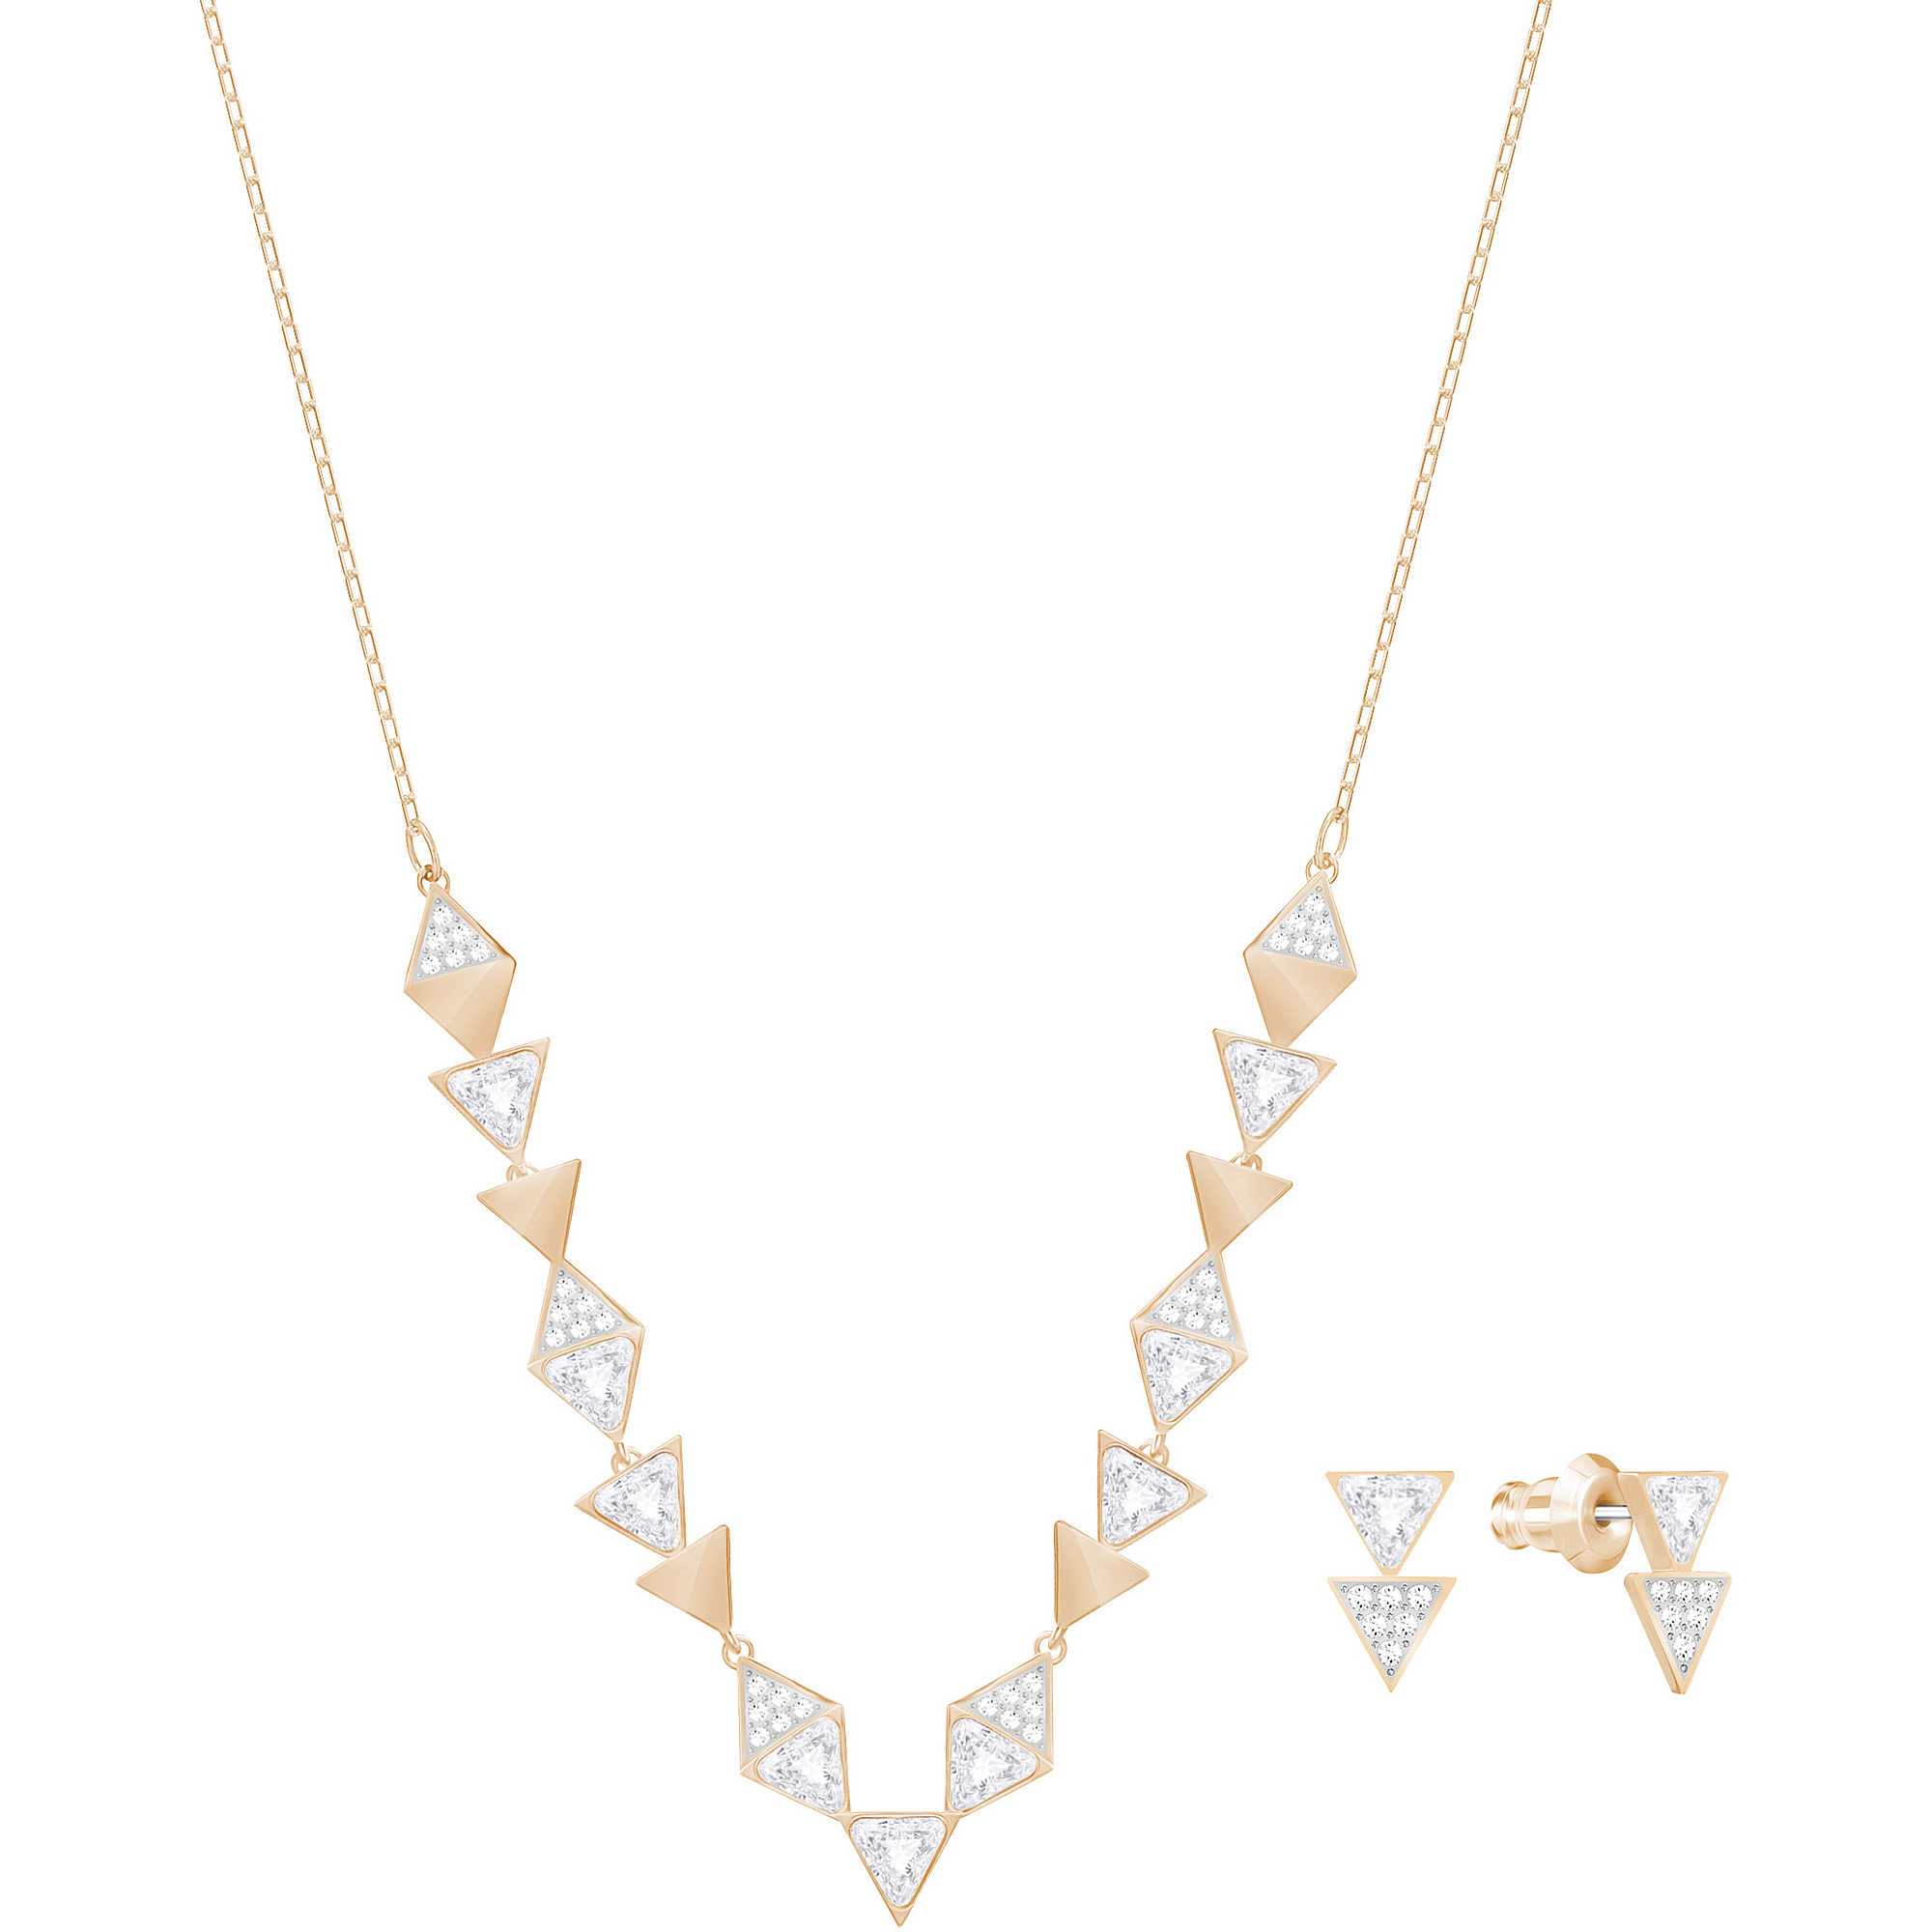 europe brass ferrari lafleur mm europa shop necklace